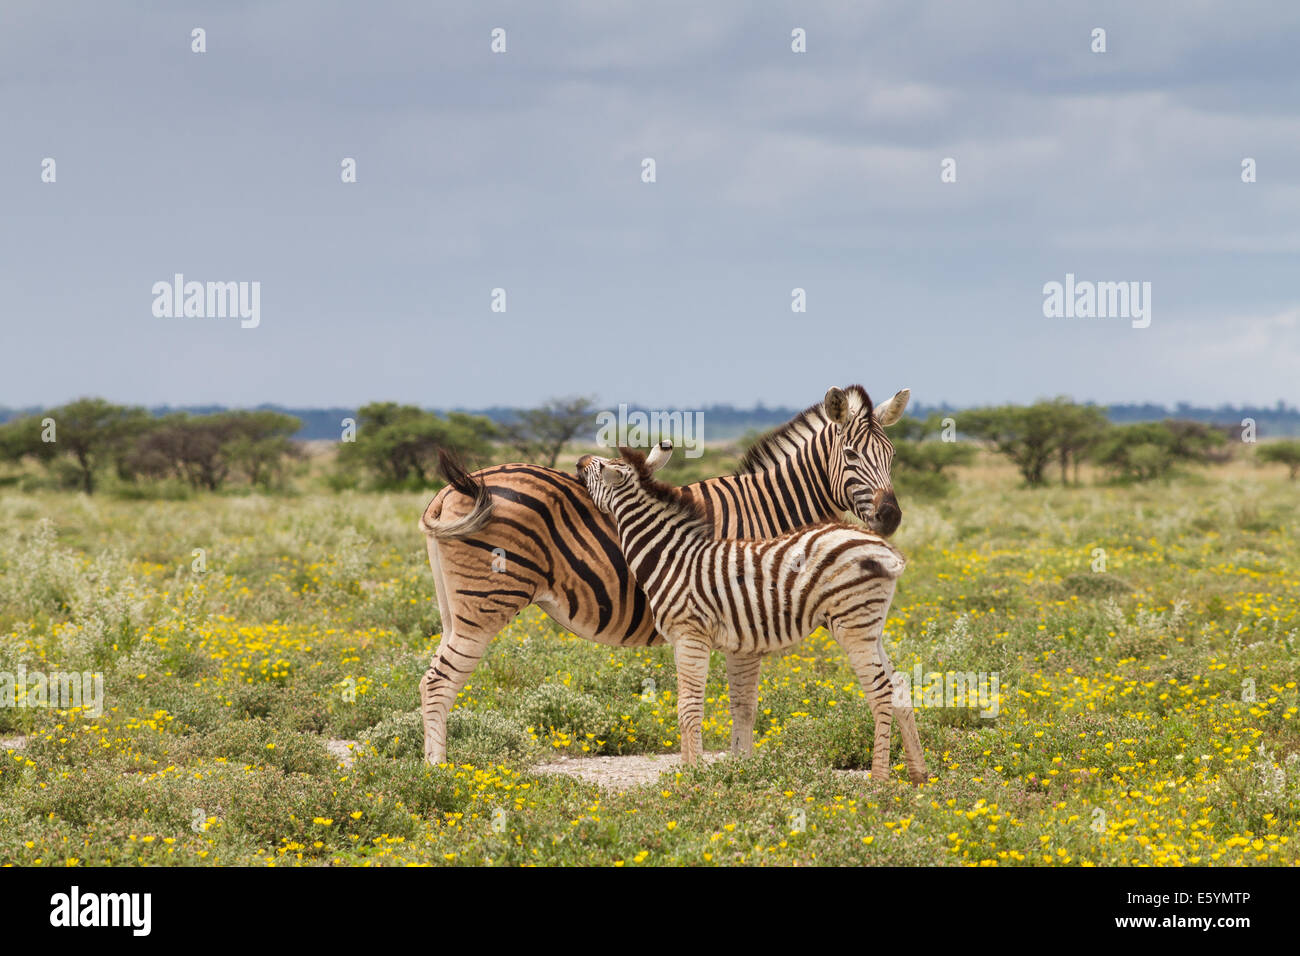 Jeune zèbre et sa mère, Etosha National Park, Namibie Photo Stock